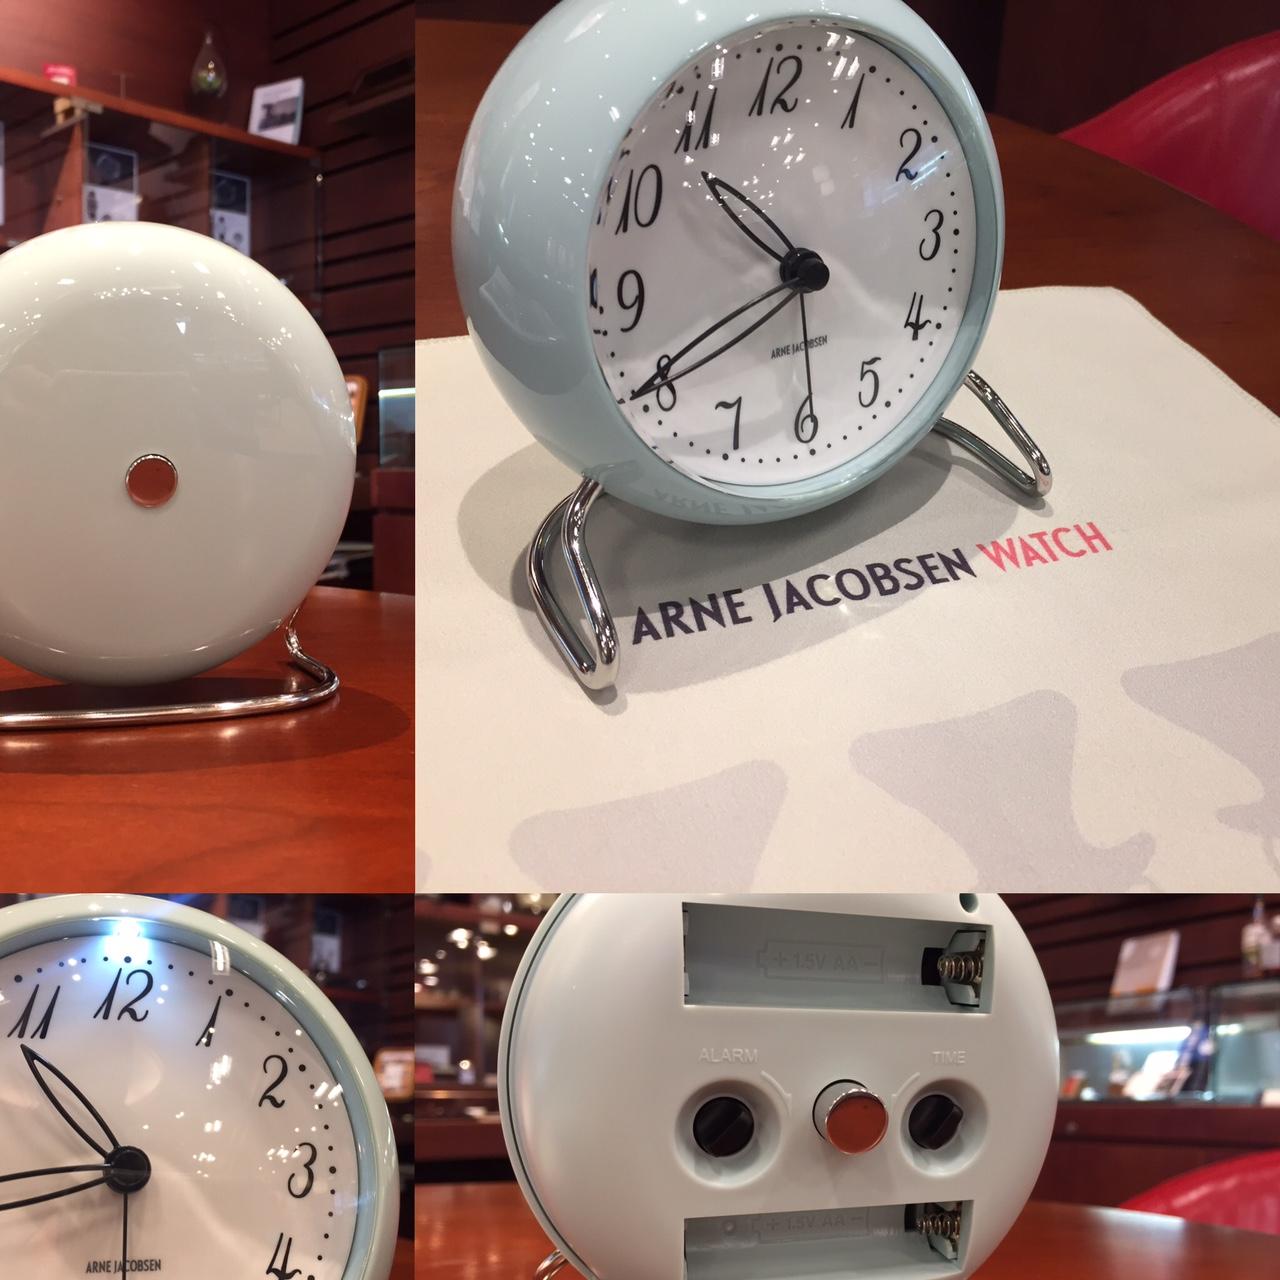 ARNE JACOBSEN(アルネ・ヤコブセン)  TABLE CLOCK(テーブルクロック) LK 限定カラー